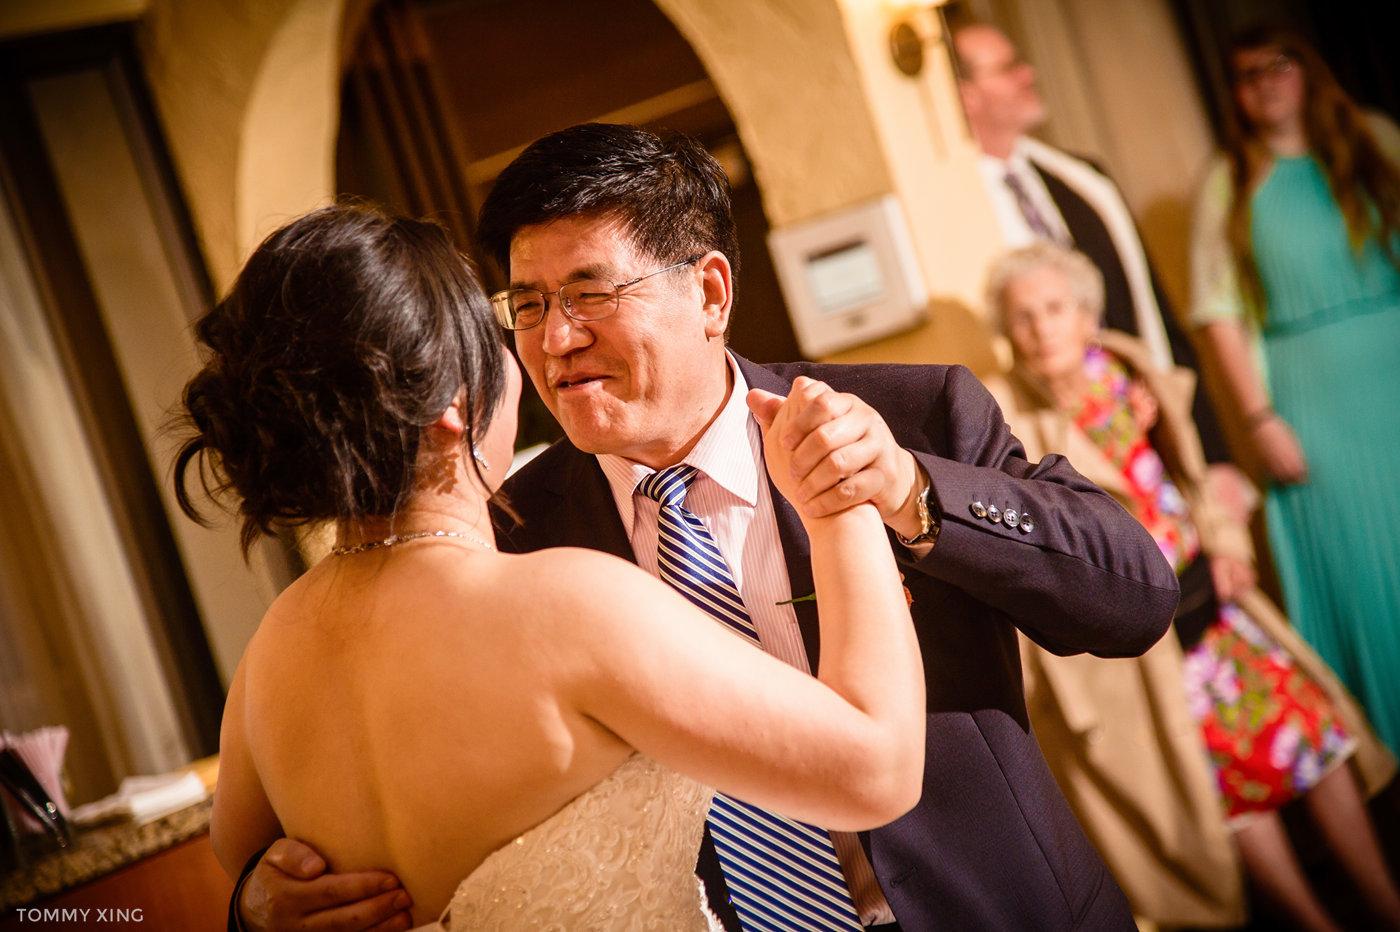 STANFORD MEMORIAL CHURCH WEDDING - Wenjie & Chengcheng - SAN FRANCISCO BAY AREA 斯坦福教堂婚礼跟拍 - 洛杉矶婚礼婚纱照摄影师 Tommy Xing Photography259.jpg